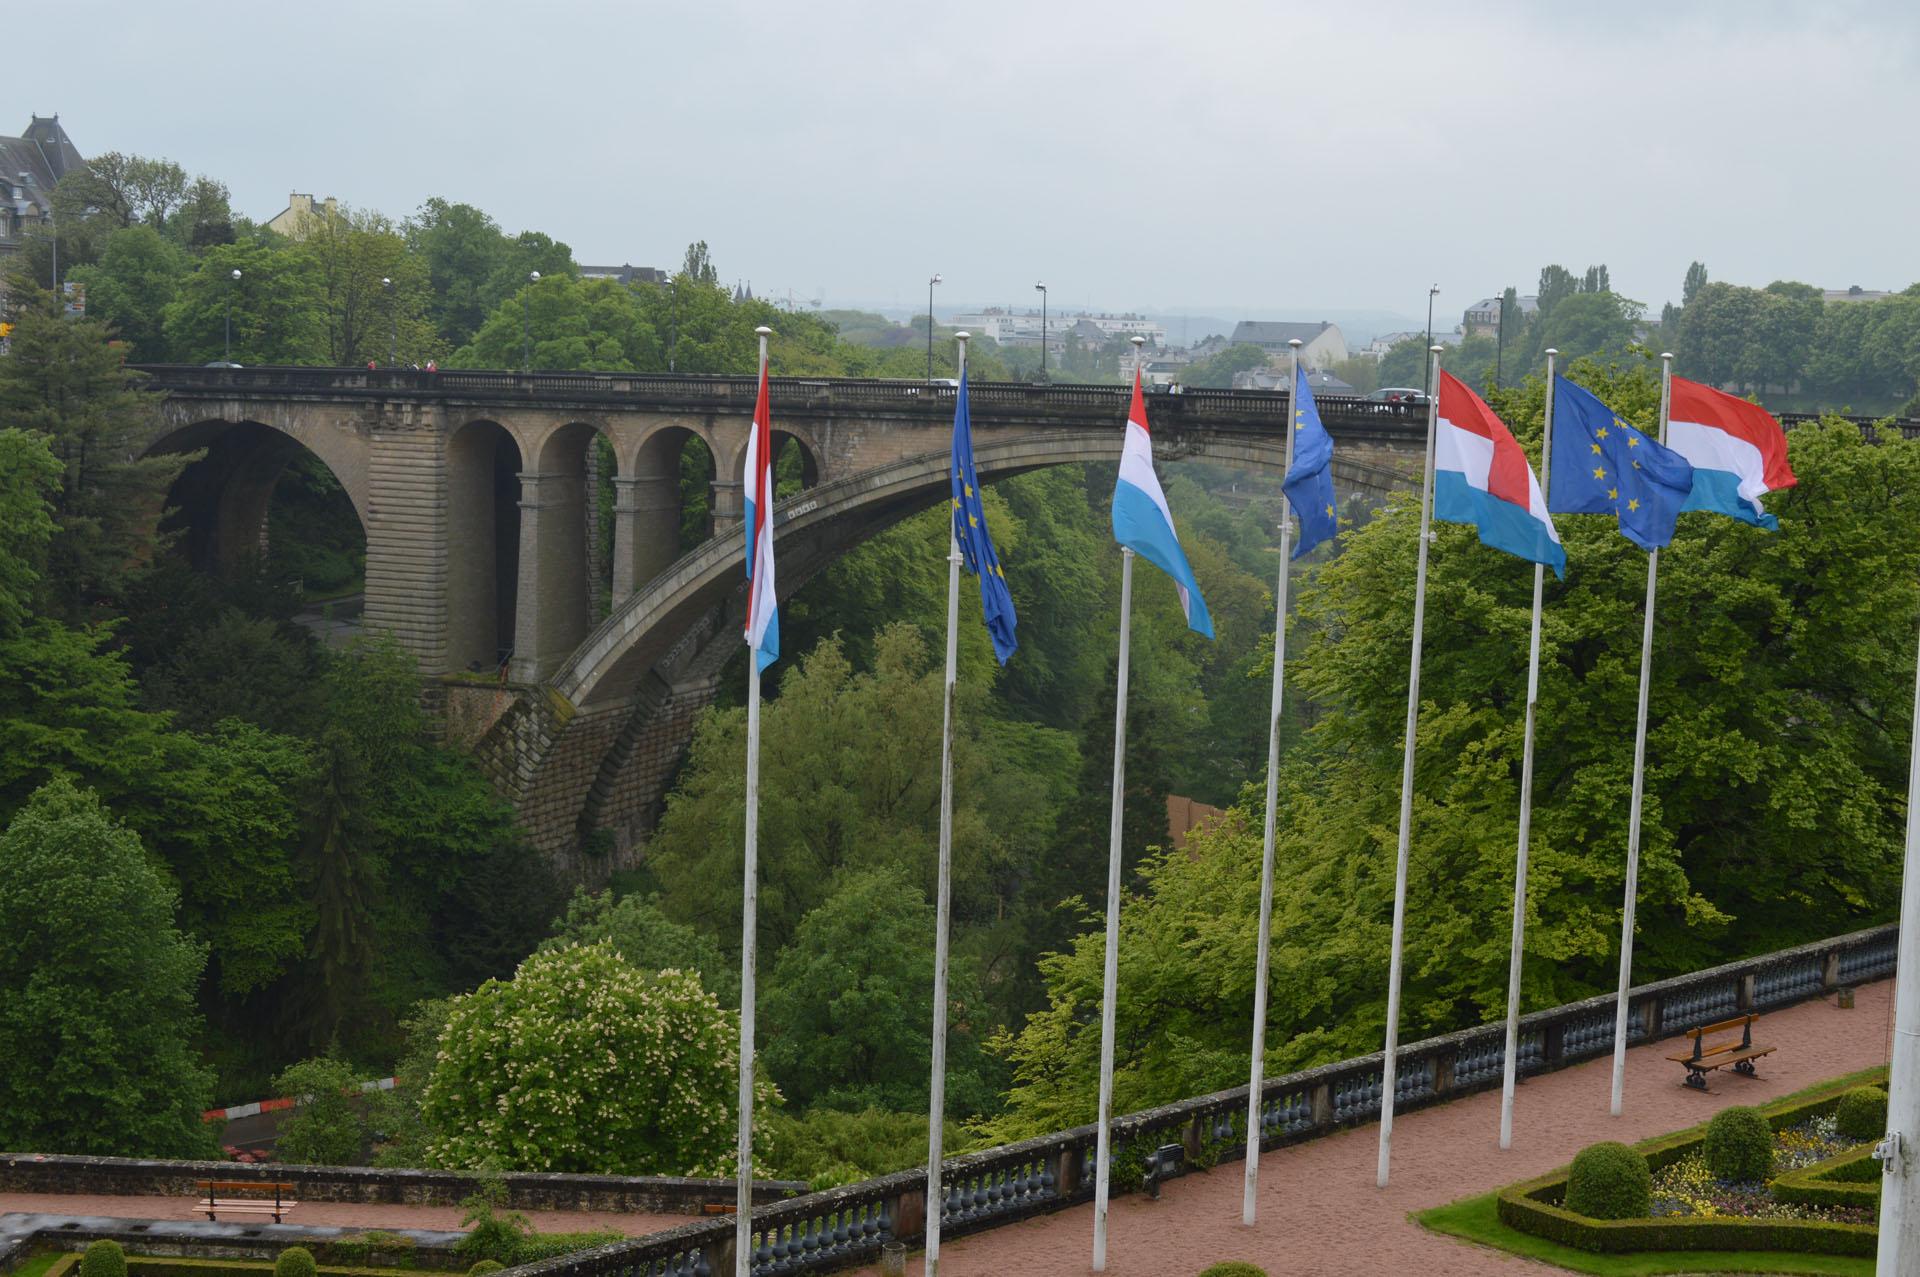 Pont Adolphe Luxemburg stad